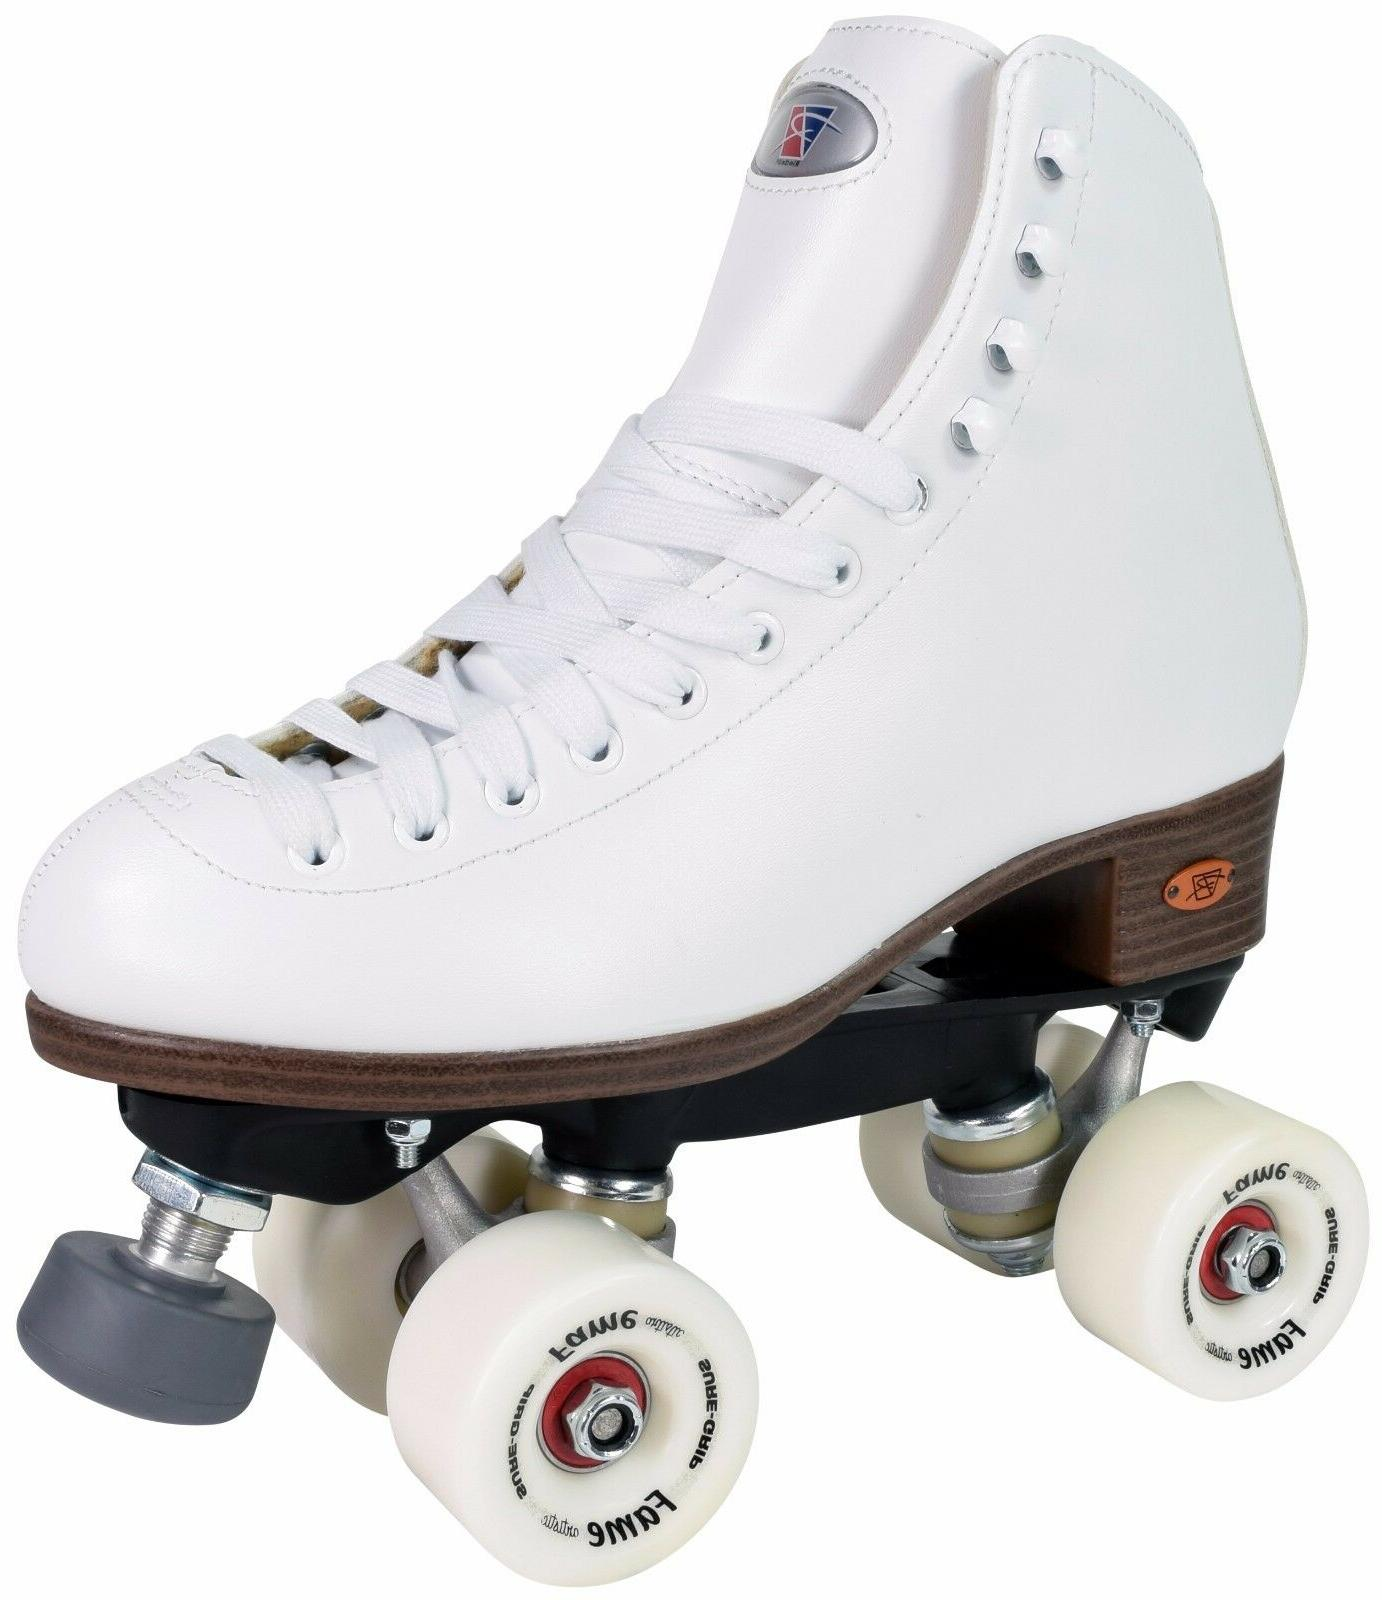 111 fame roller skates traditional high top